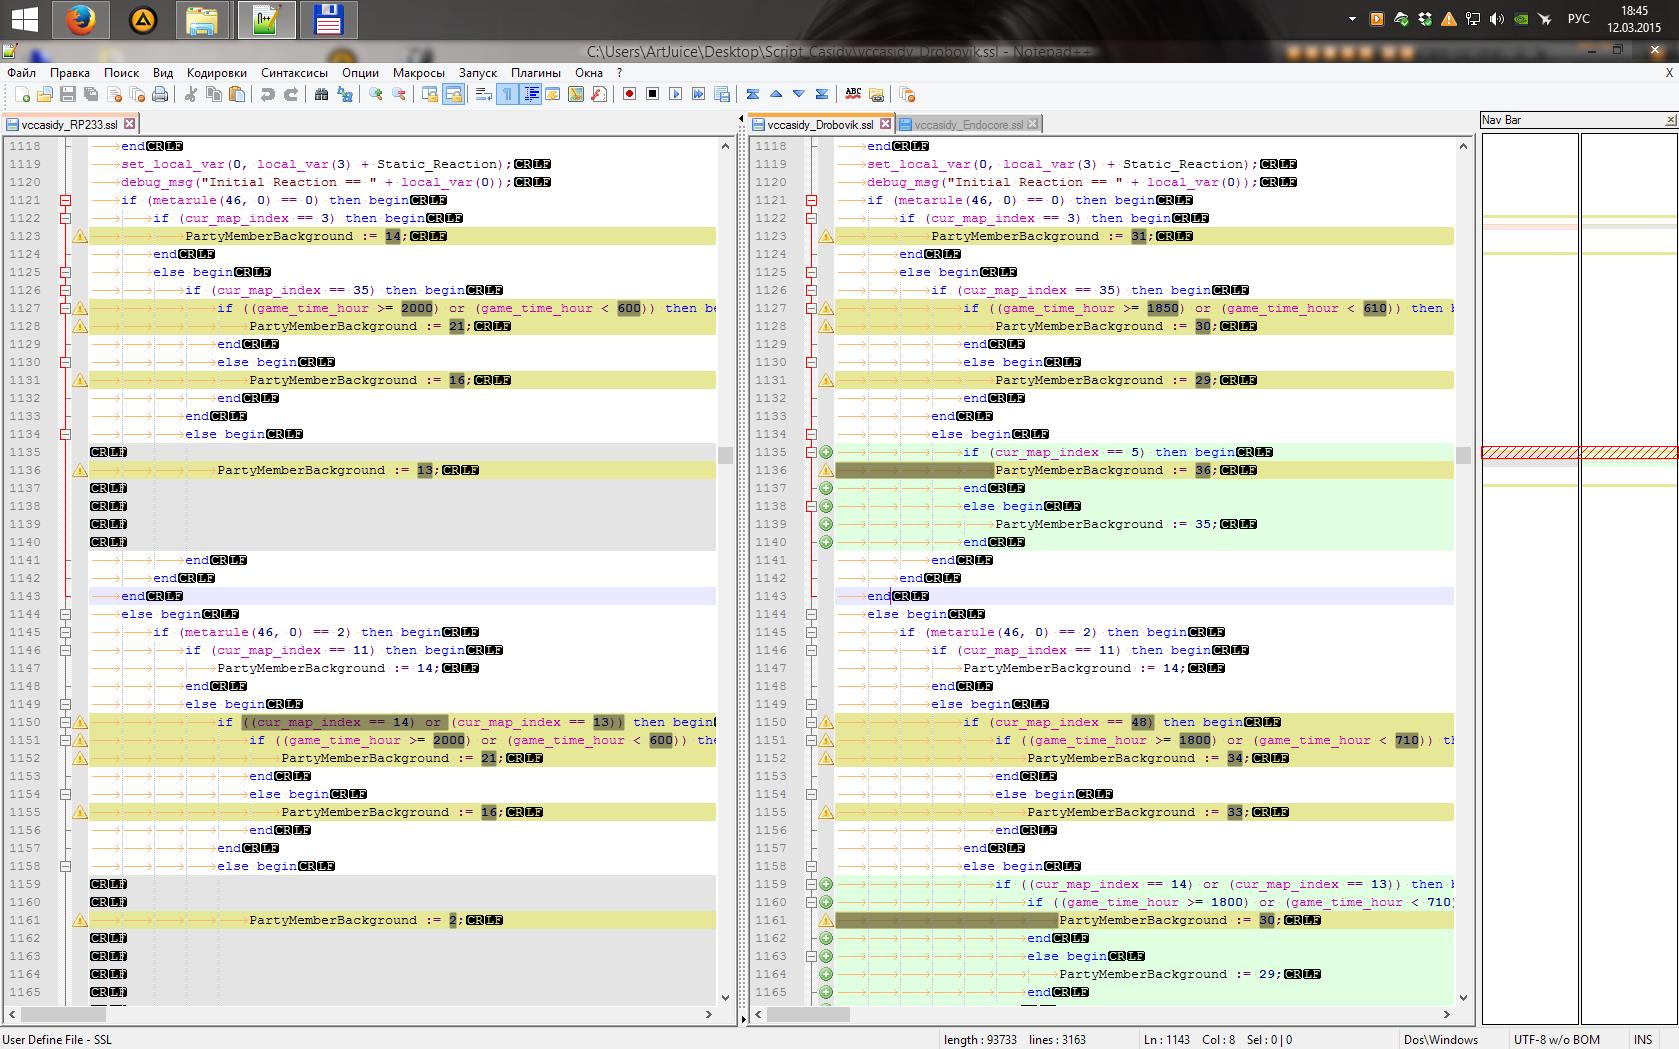 2015-03-12 18-45-57 C  Users ArtJuice Desktop Script_Casidy vccasidy_Drobovik.ssl - Notepad++.png